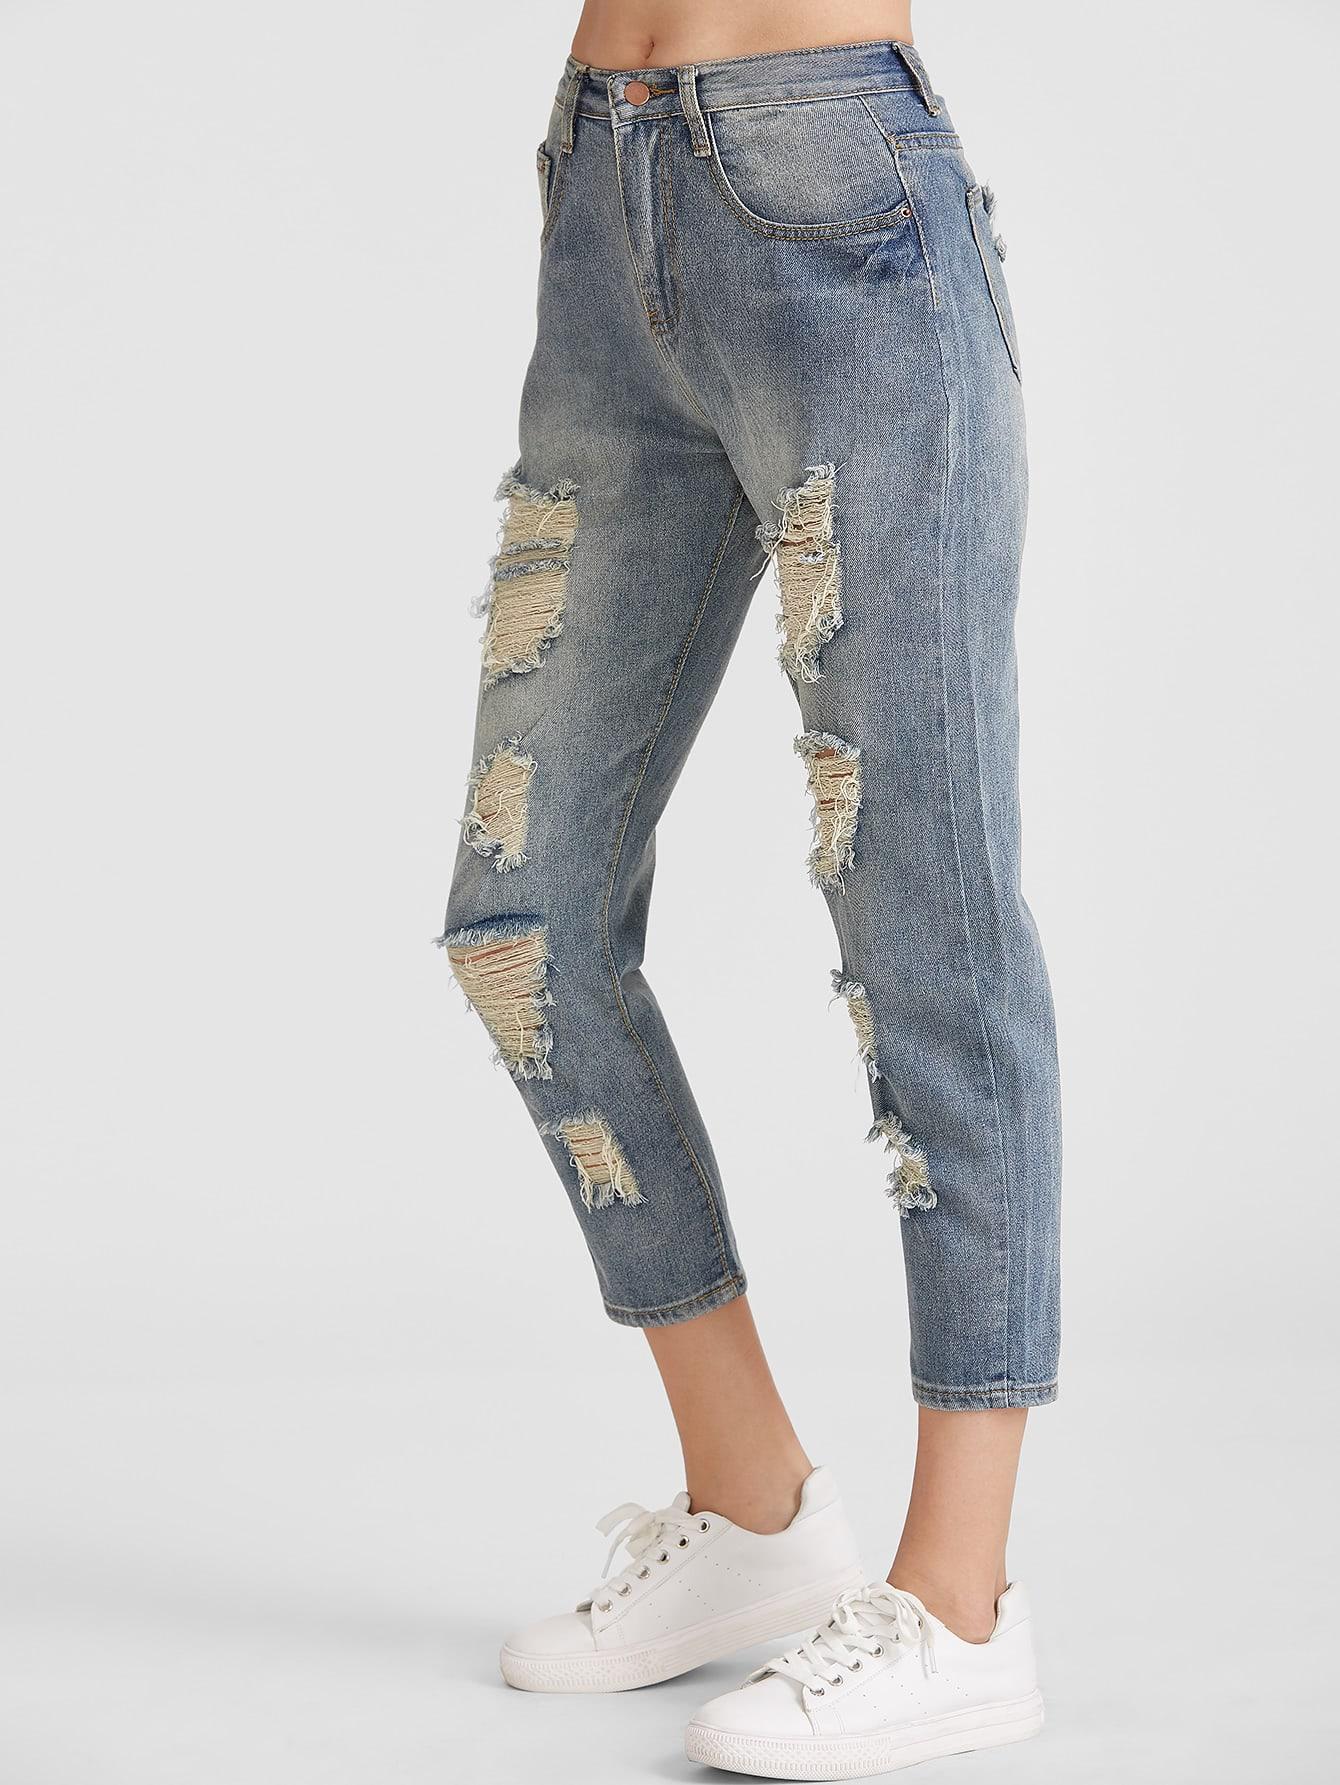 zerrissene jeans gewaschen effekt hellblau german romwe. Black Bedroom Furniture Sets. Home Design Ideas